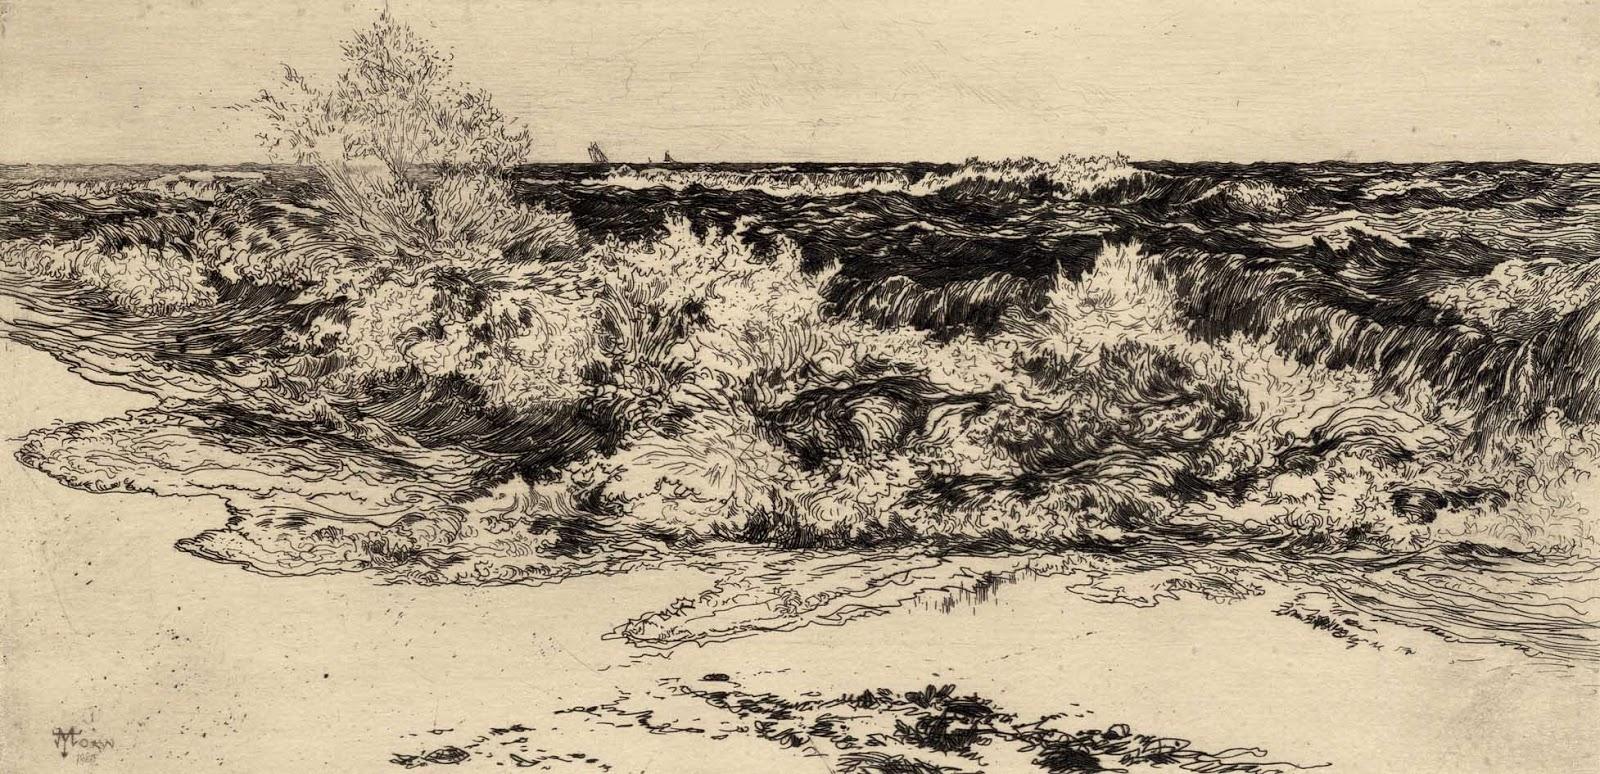 Prints And Principles Thomas Moran S Etching The Sounding Sea